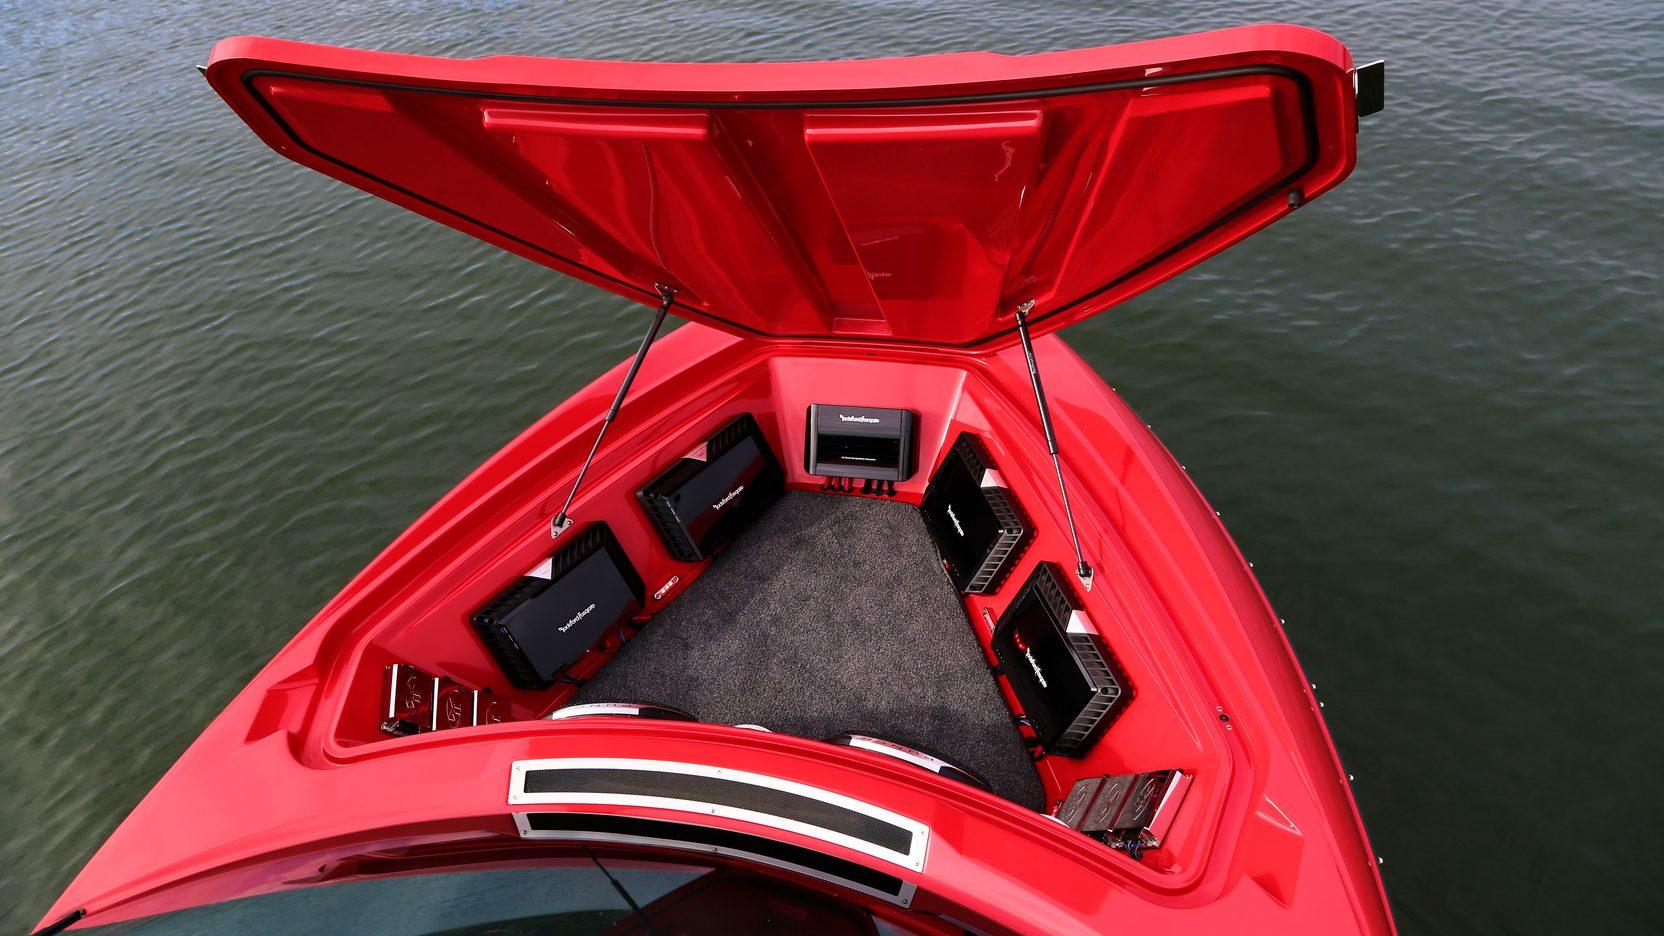 2008 Malibu Corvette Z06 font hatch stereo speakers